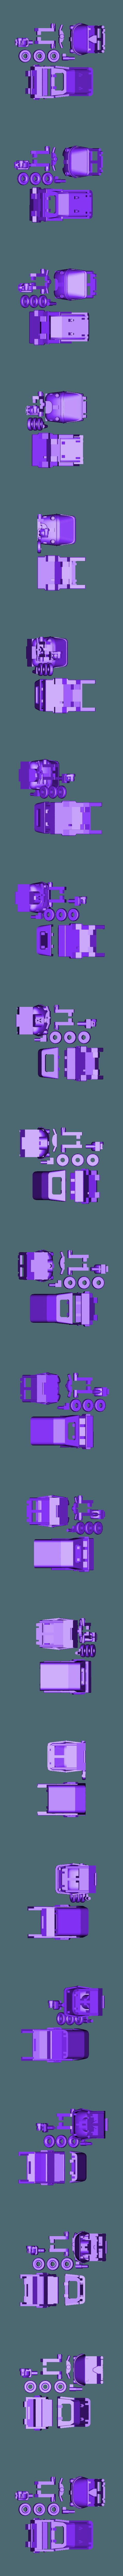 All_Parts_3wheels_car.stl Download free STL file Classic 3 Wheels Car no support • Design to 3D print, Toymakr3D